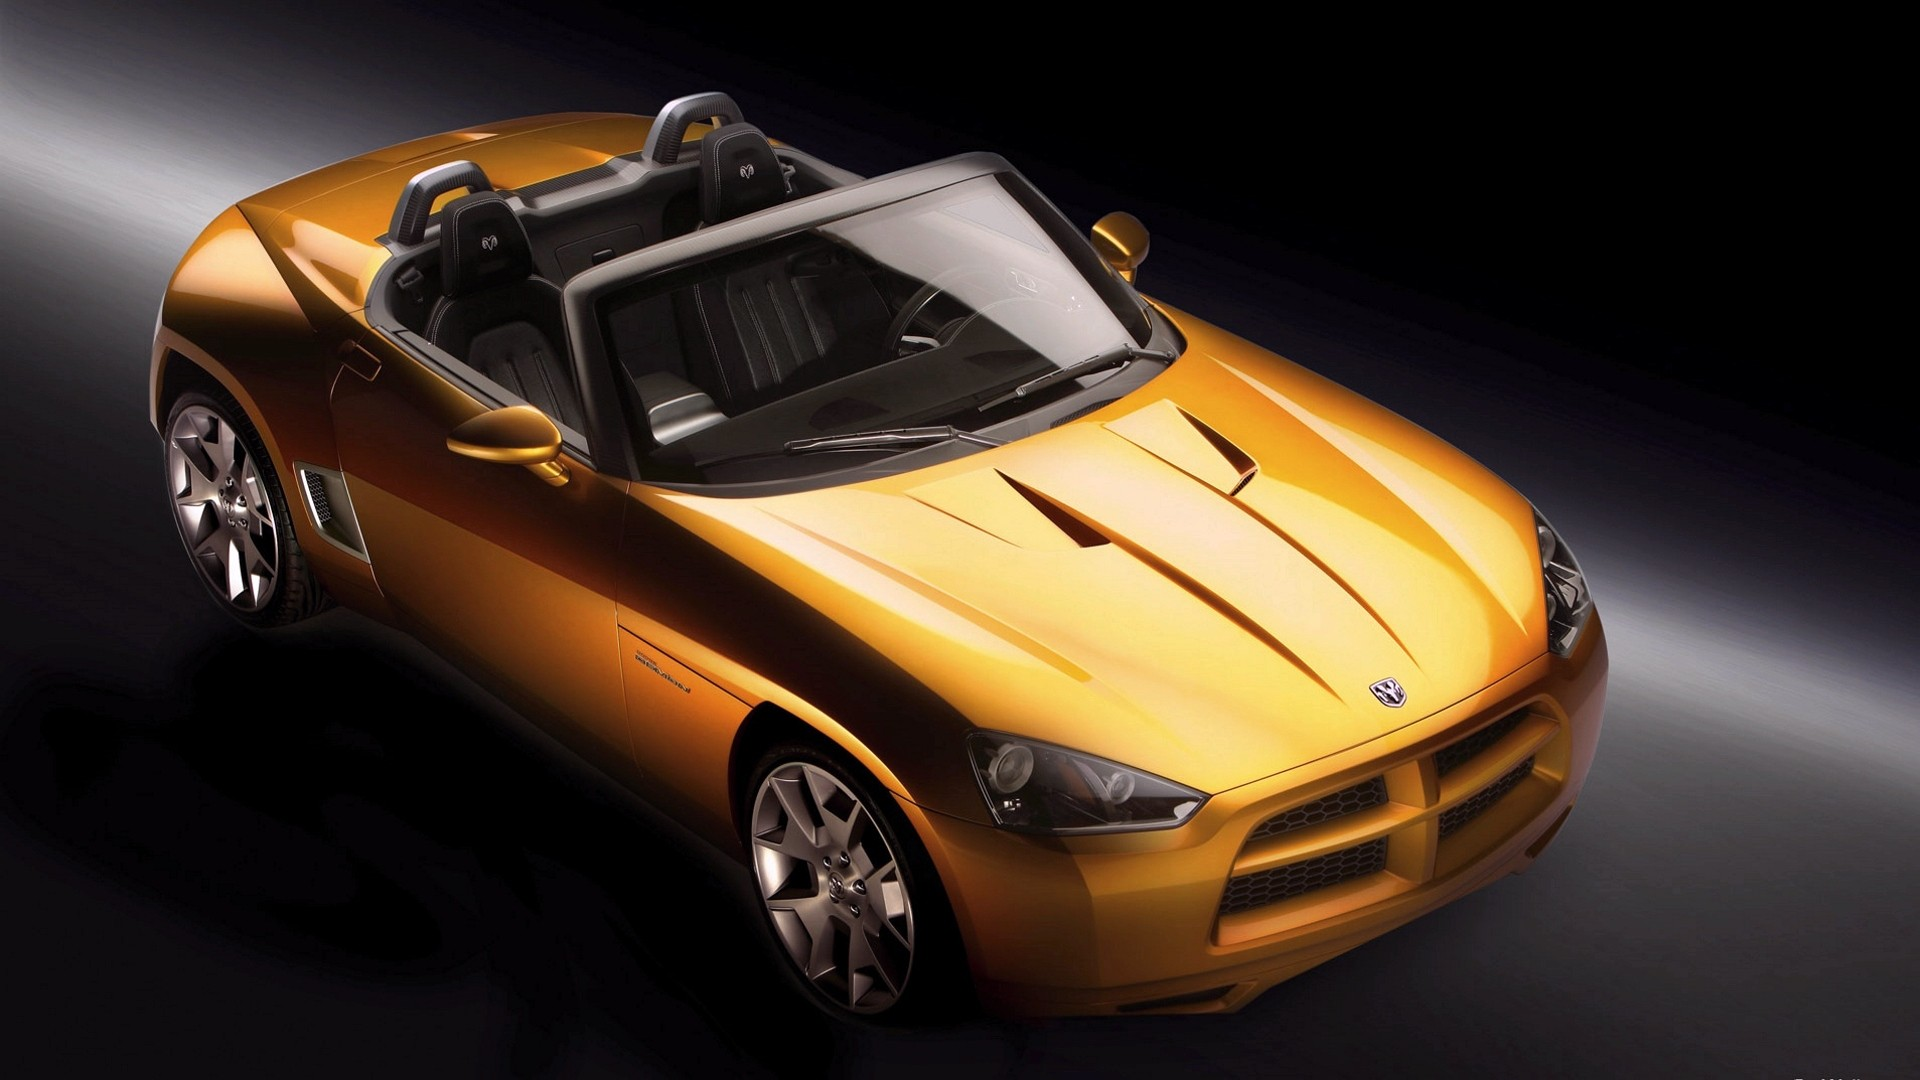 General 1920x1080 car vehicle orange cars Dodge Dodge Demon concept high angle